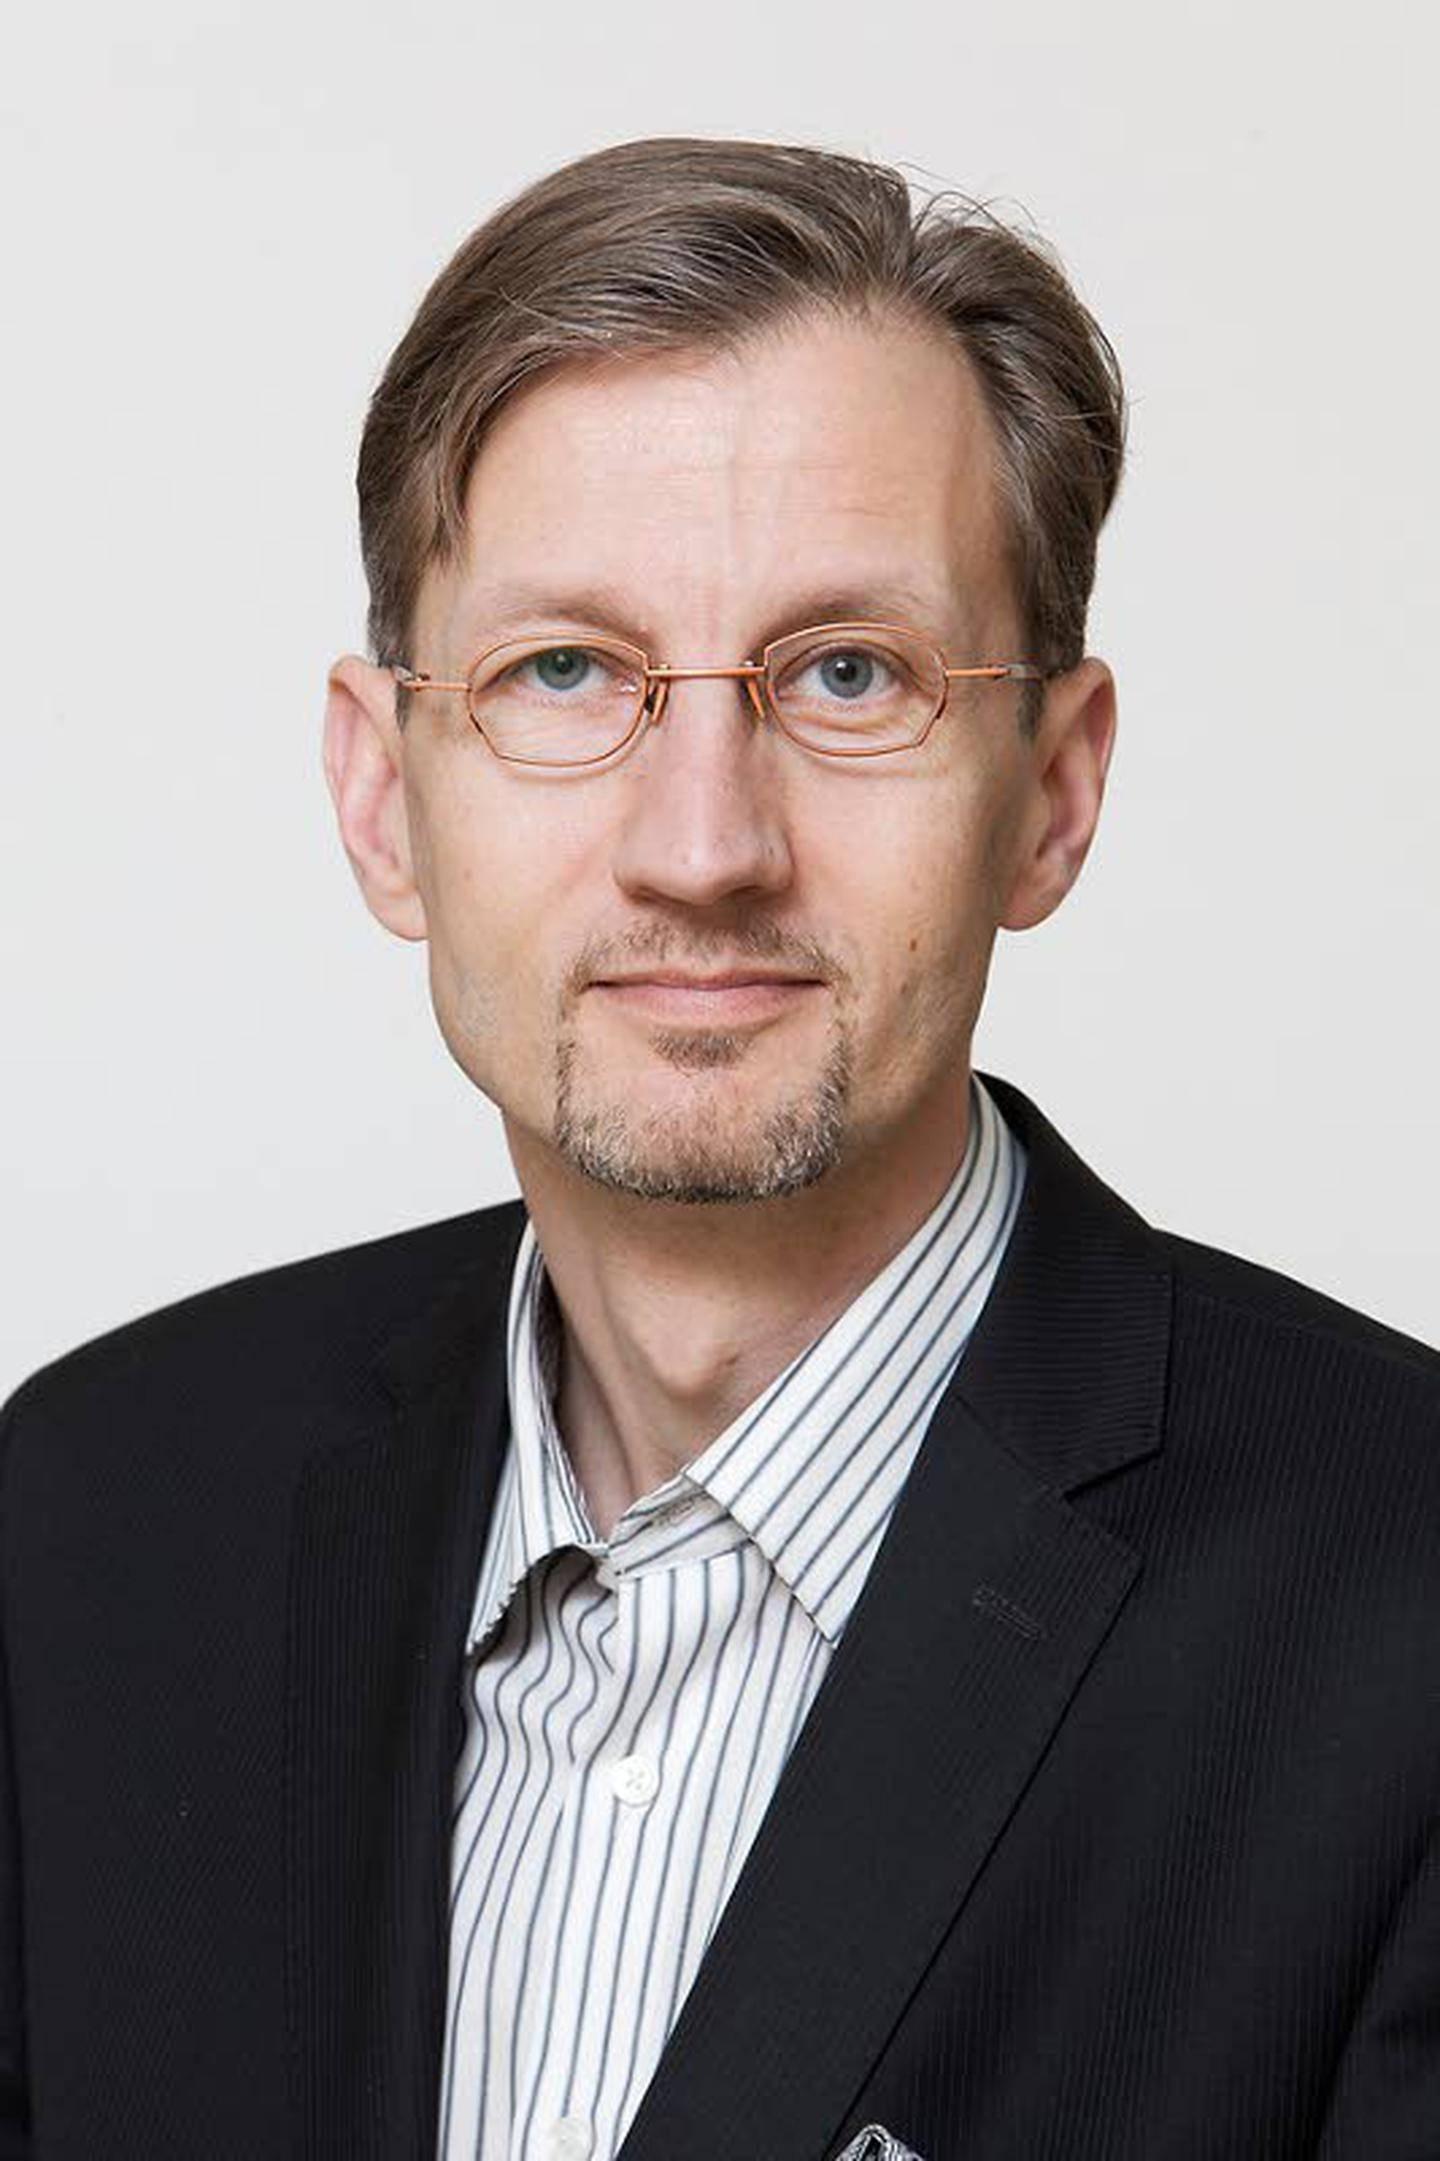 Tampereen Koulujen Lomat